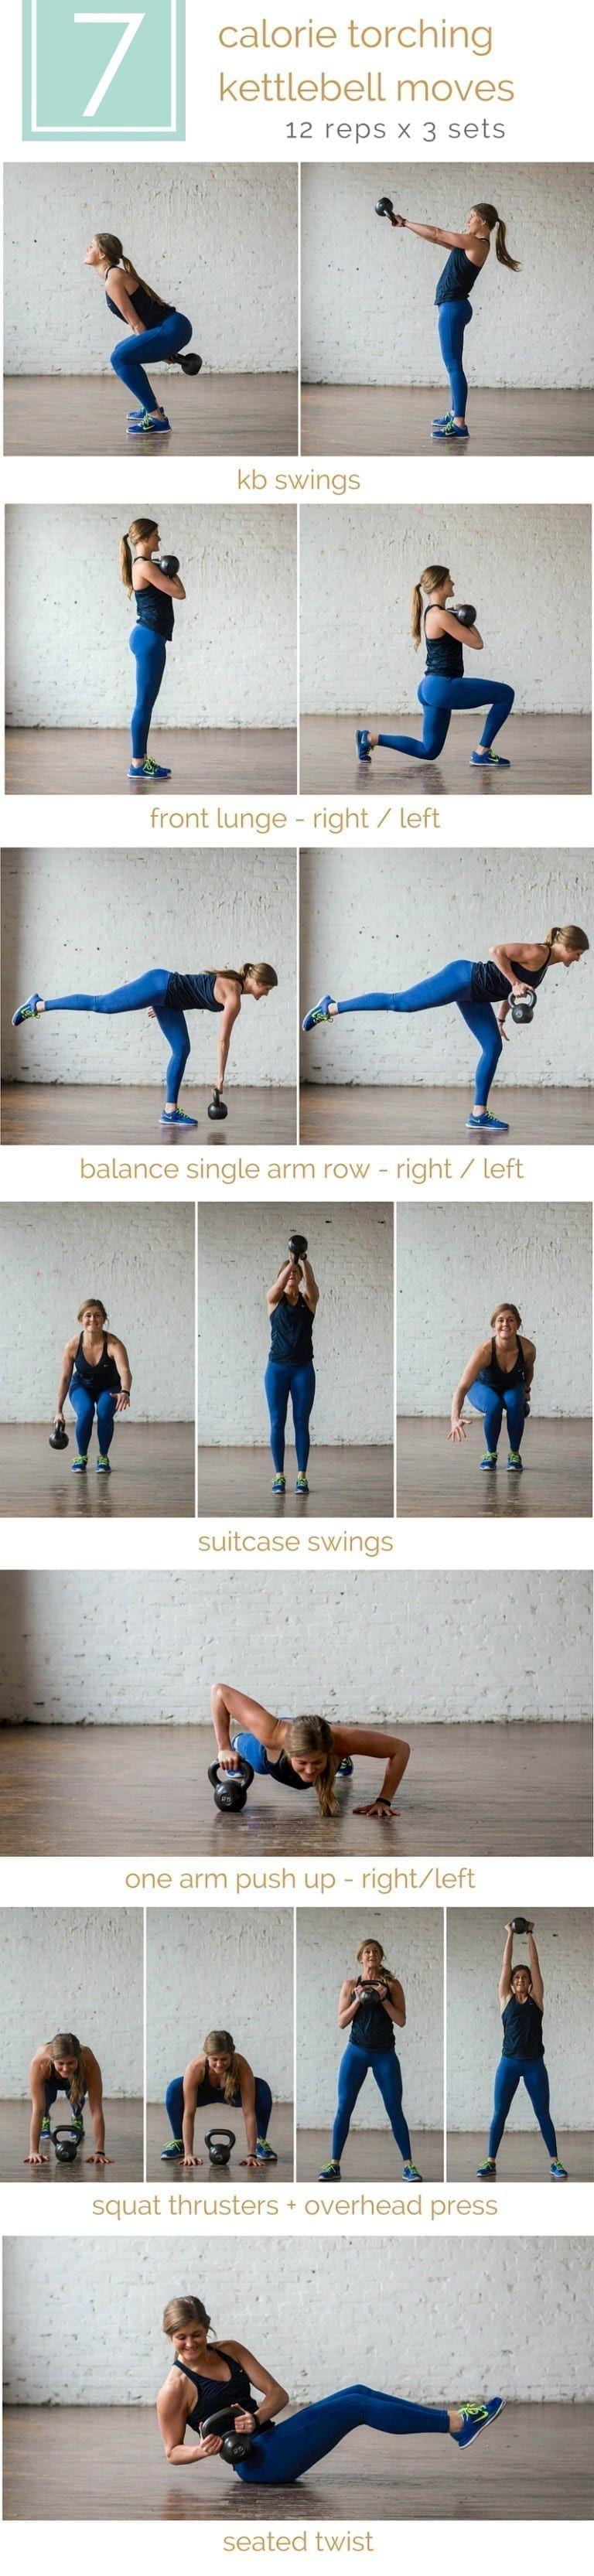 7 Calorie Torching Kettlebell Exercises | kettlebell exercises | kettlebell workout | HIIT workout |...